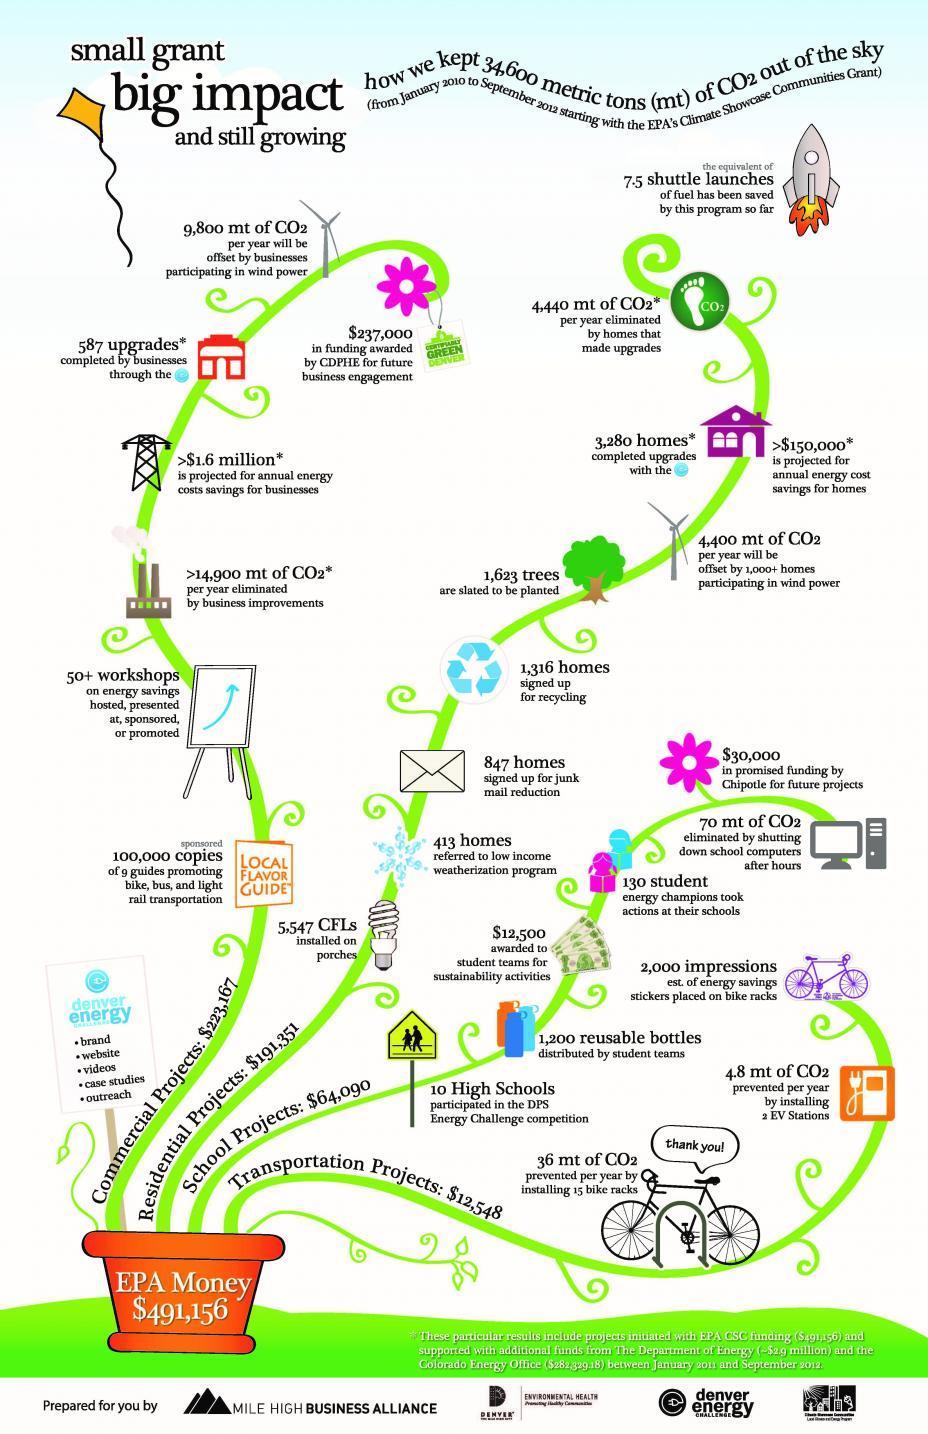 Small Grants, Big Impact Infographic